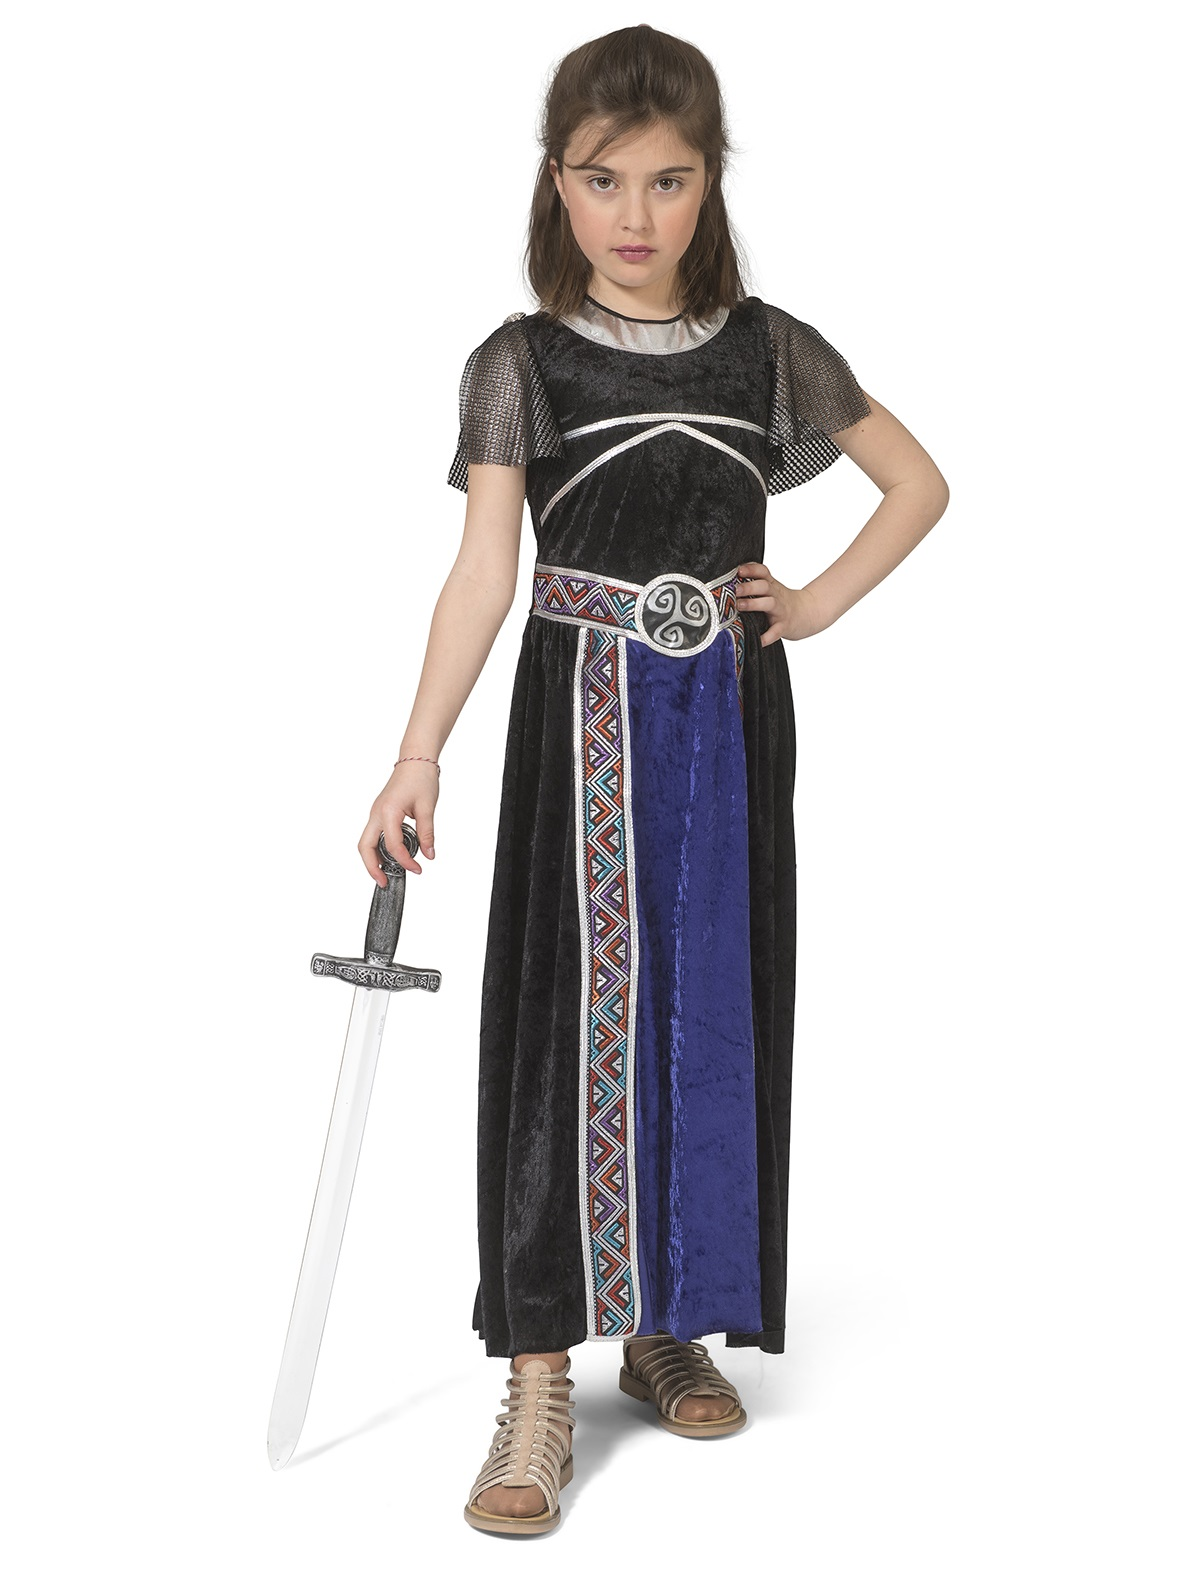 Romeinse krijgster 1